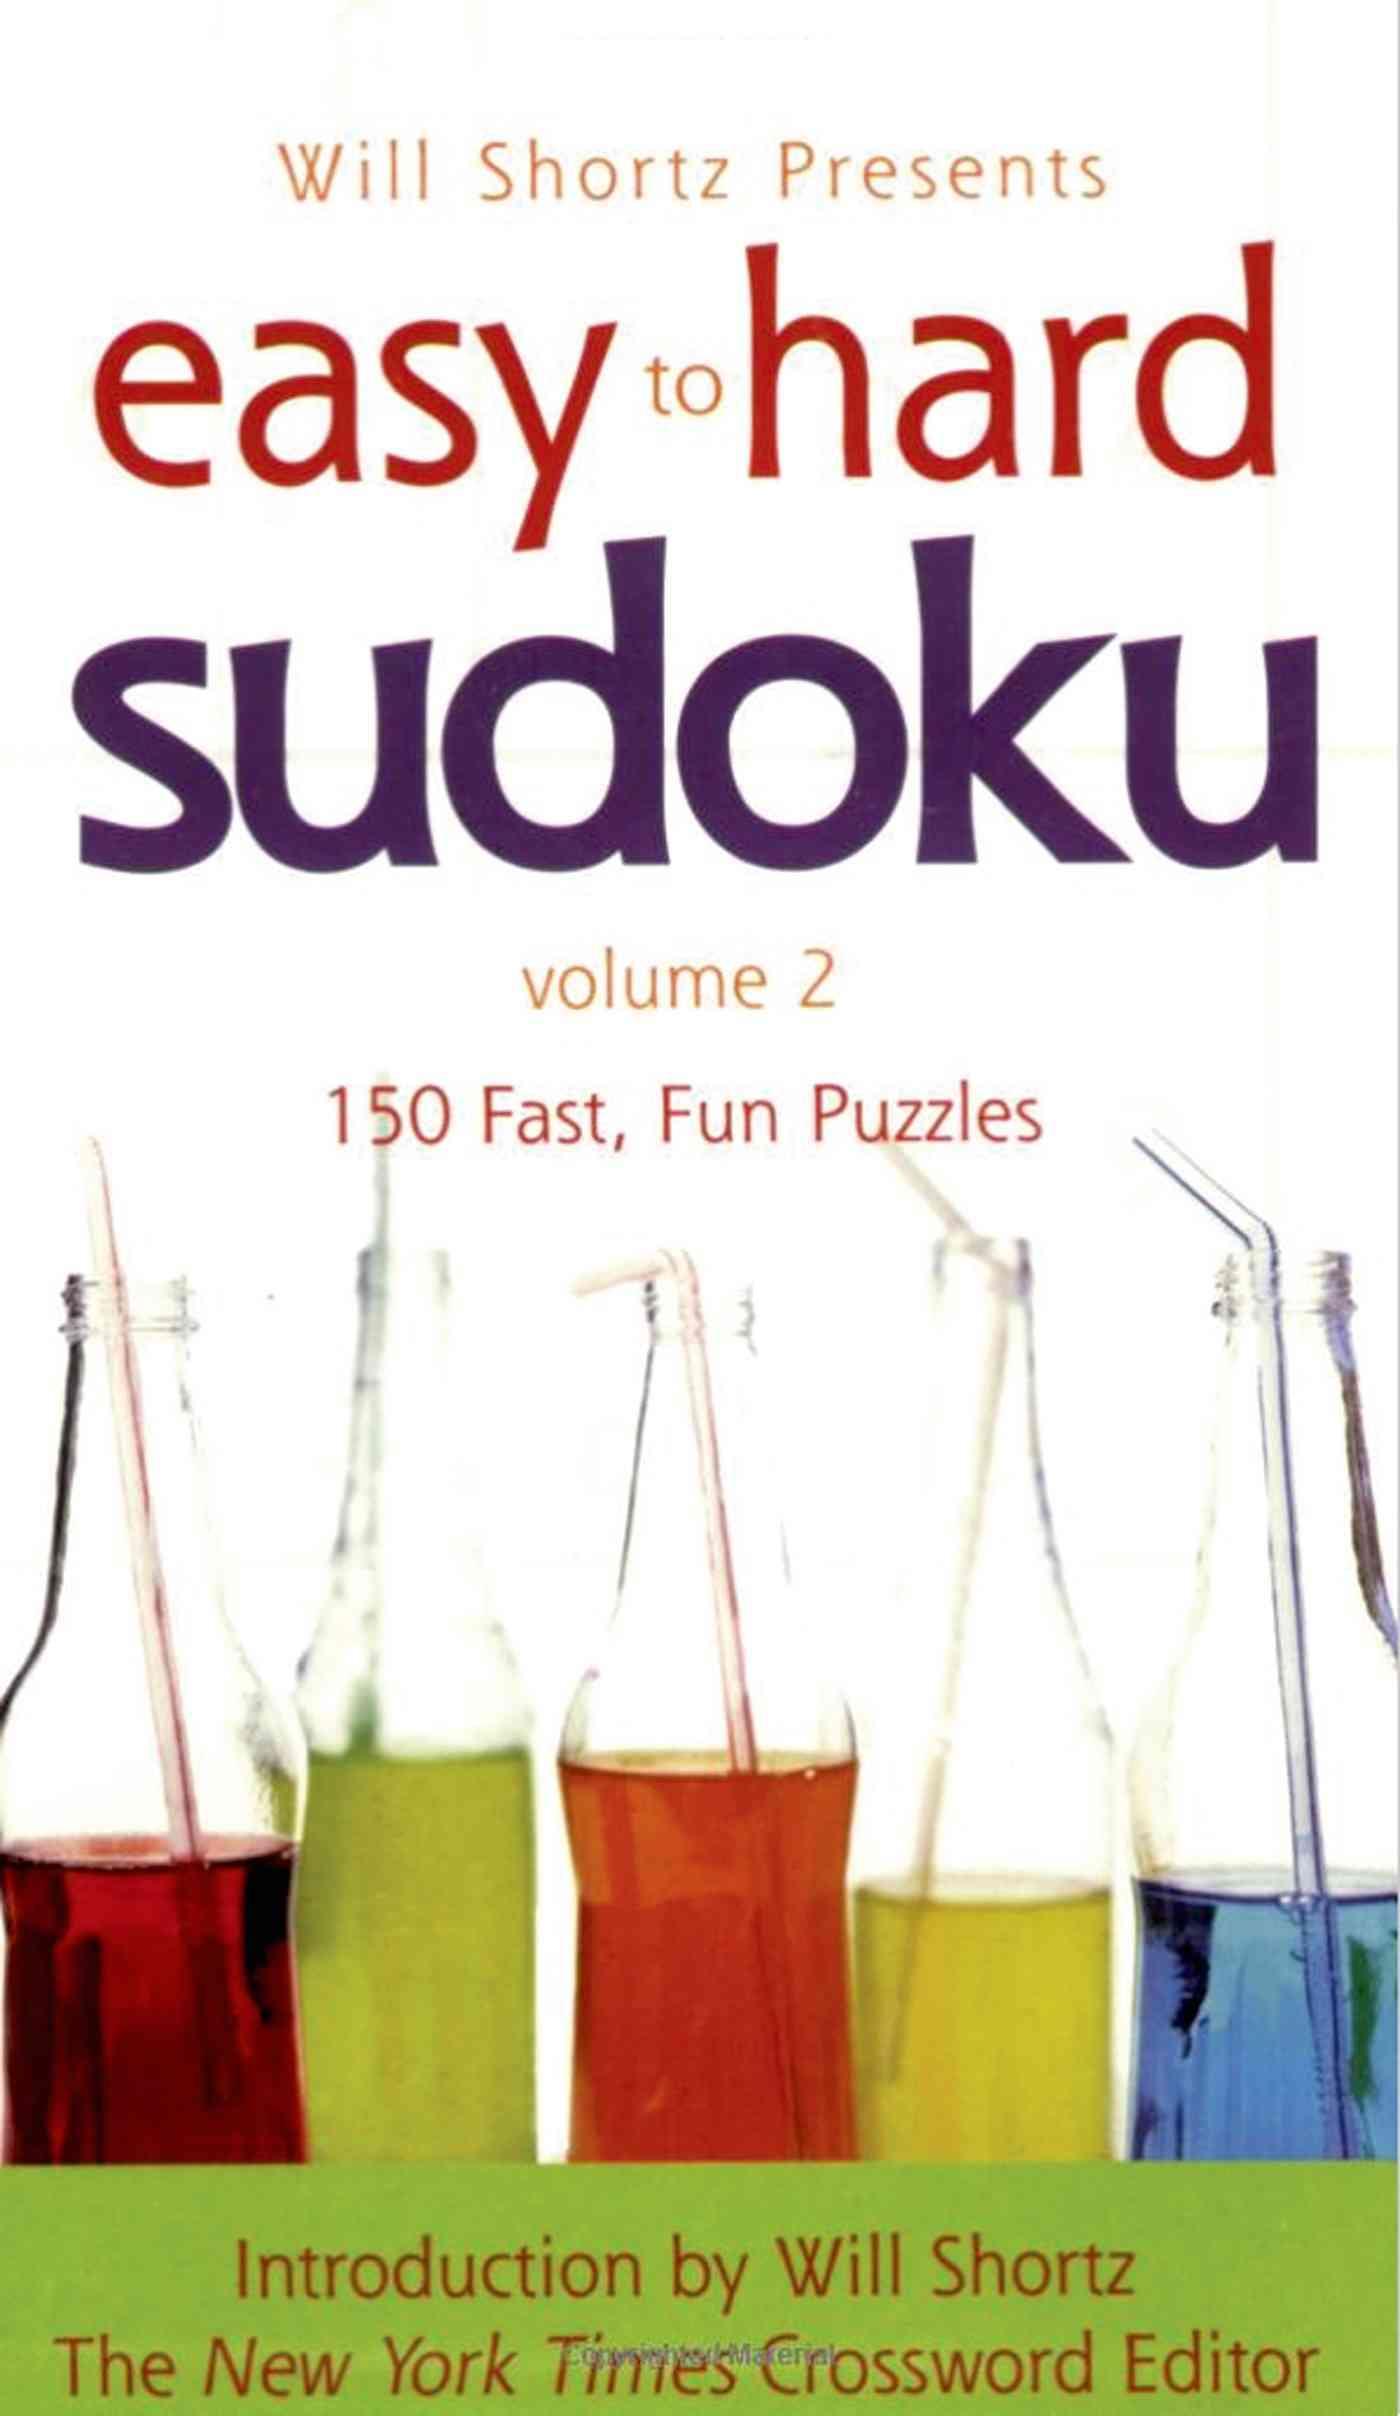 Easy to Hard Sudoku By Shortz, Will